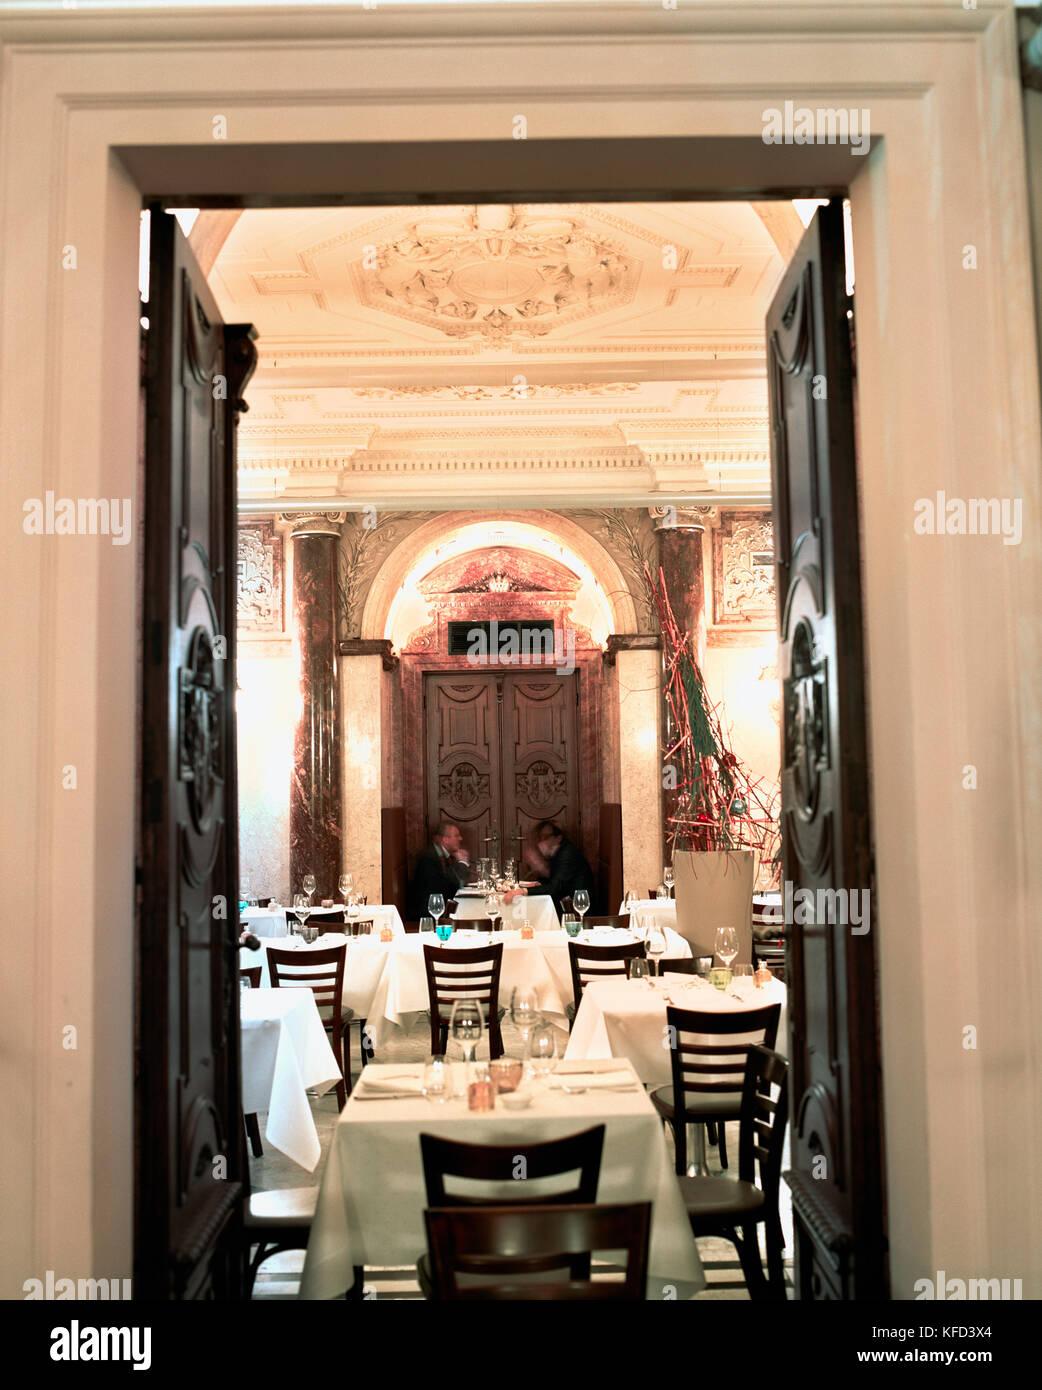 Austria Vienna Interior Of Vestibul Restaurant People Dining In